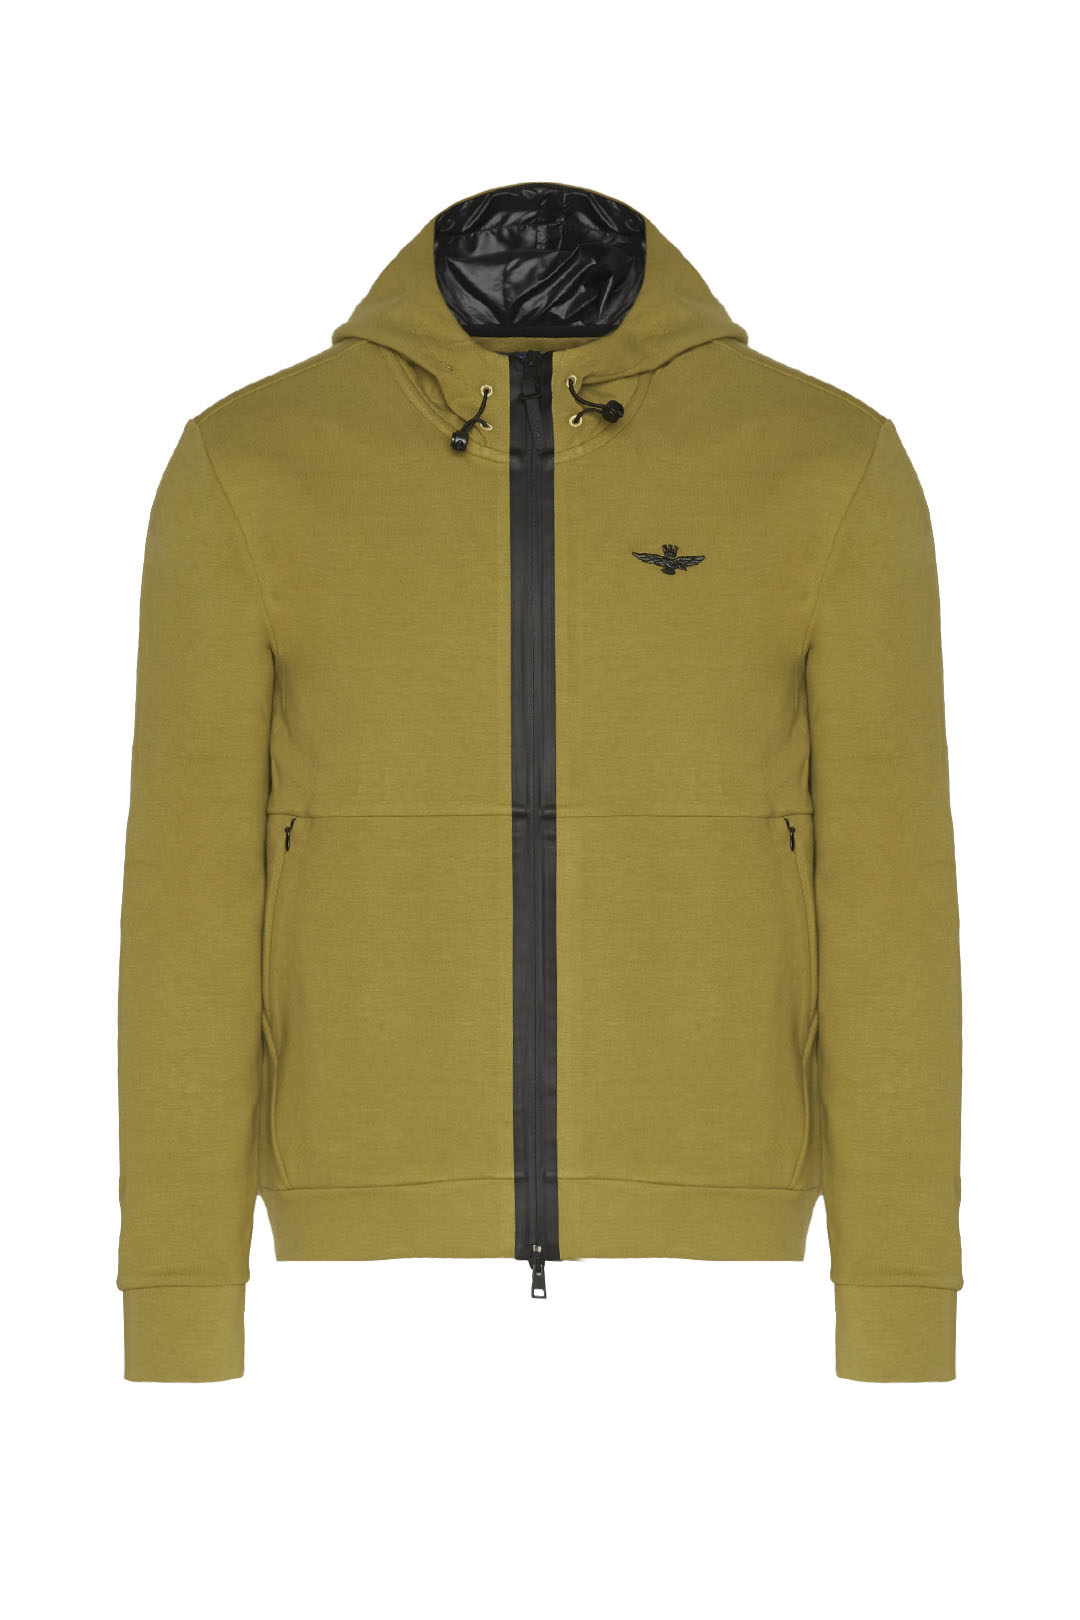 Interlock cotton hooded sweatshirt